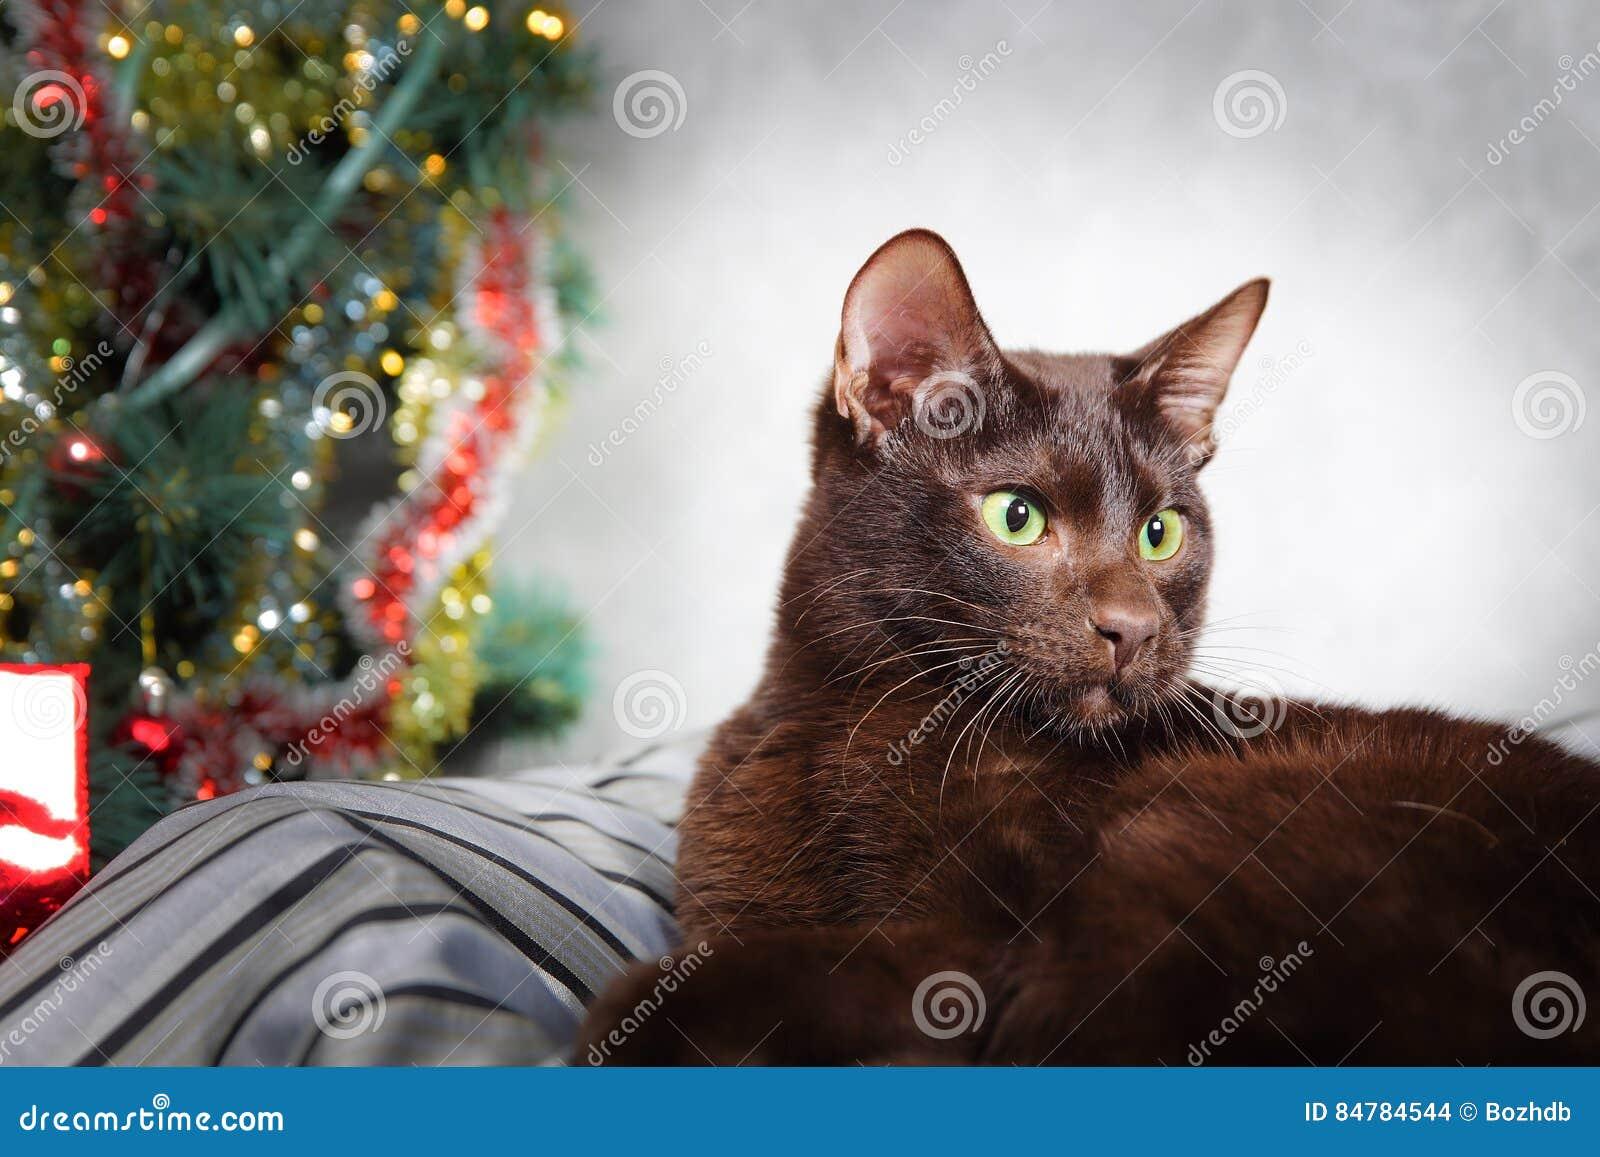 756325be14ed Καφετιά Αβάνα σιαμέζα - η ασιατική γάτα στο υπόβαθρο χριστουγεννιάτικων  δέντρων